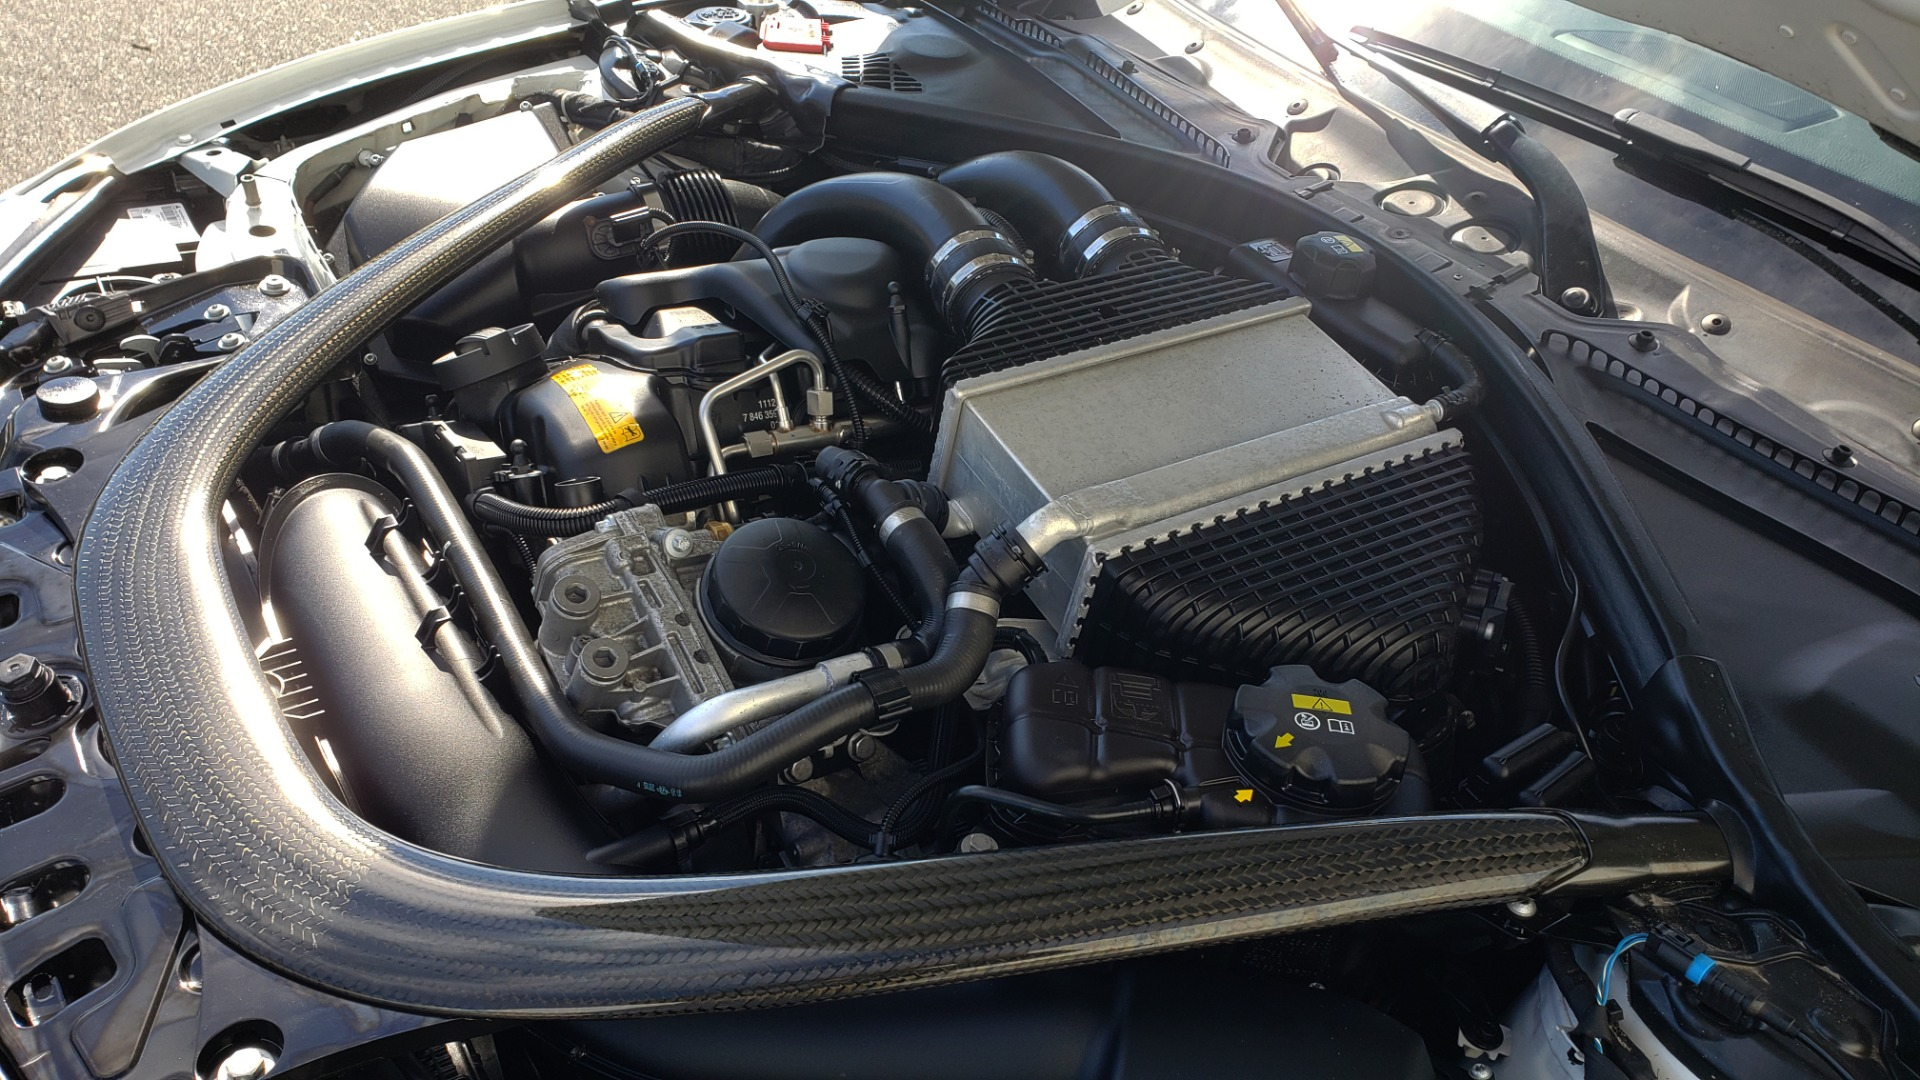 Used 2016 BMW M3 SEDAN / EXECUTIVE PKG / M-SUSPENSION / HARMAN/KARDON SOUND for sale Sold at Formula Imports in Charlotte NC 28227 24